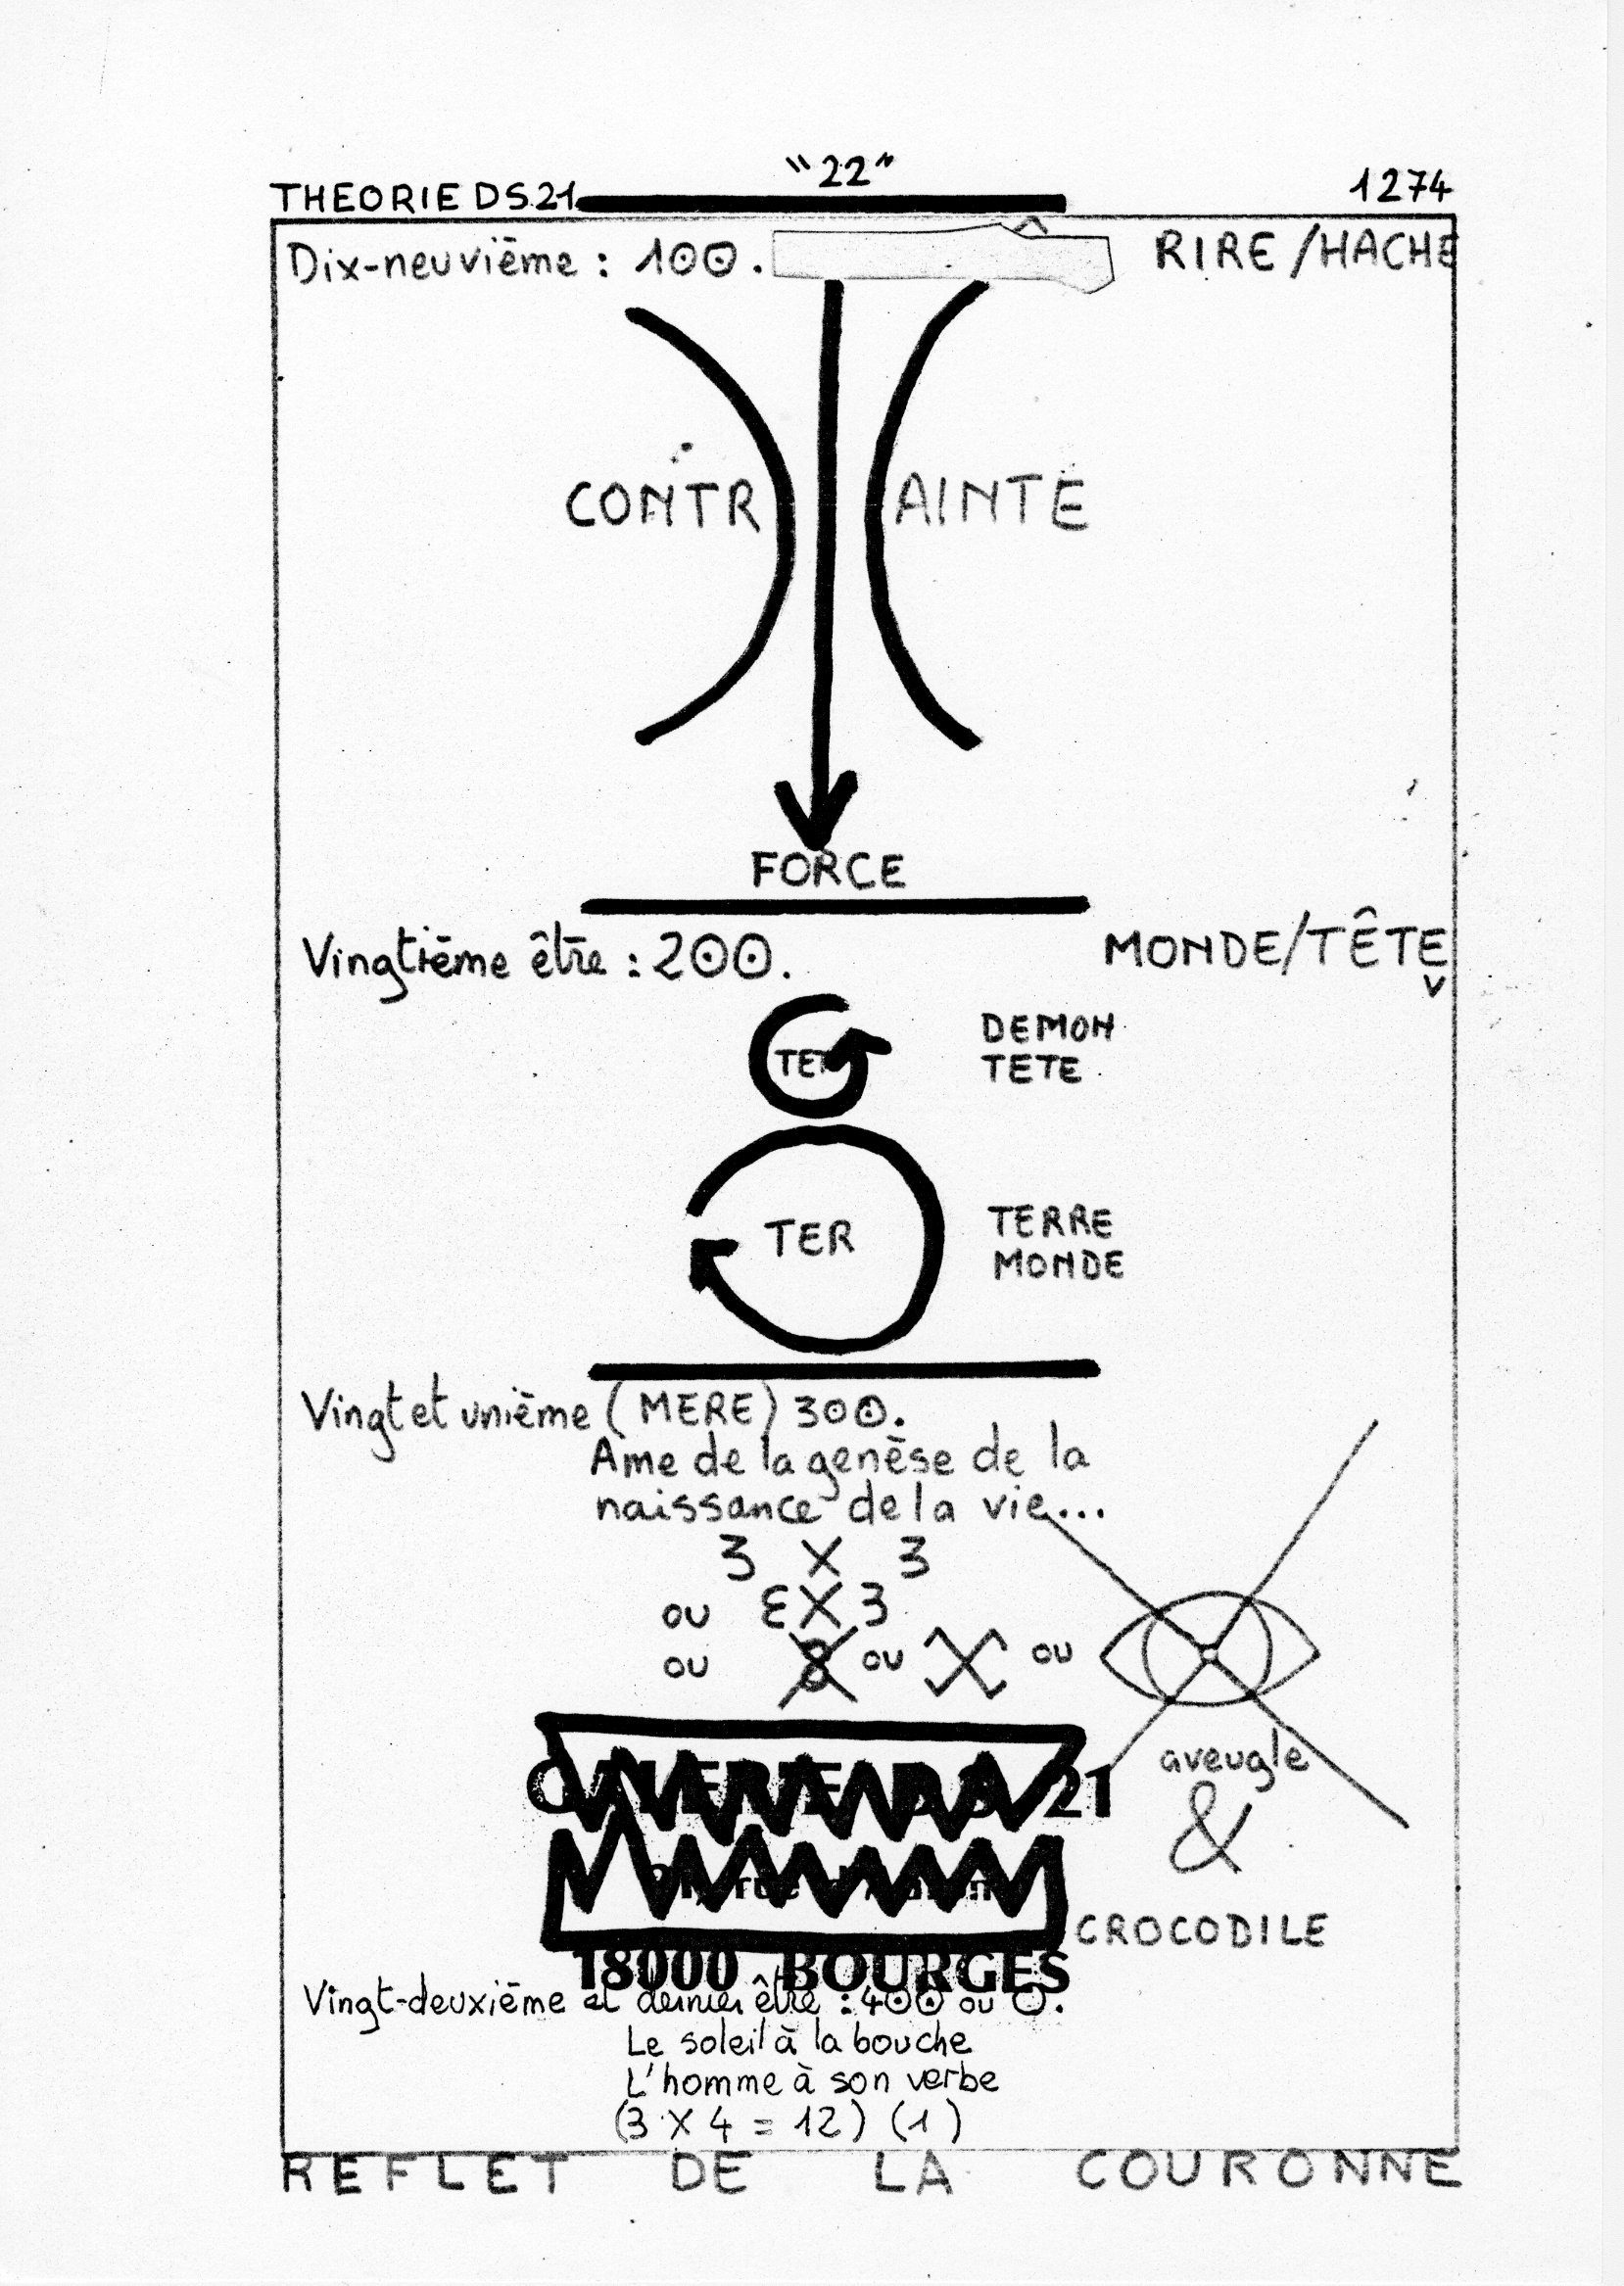 page 1274 Théorie D.S. 21 22